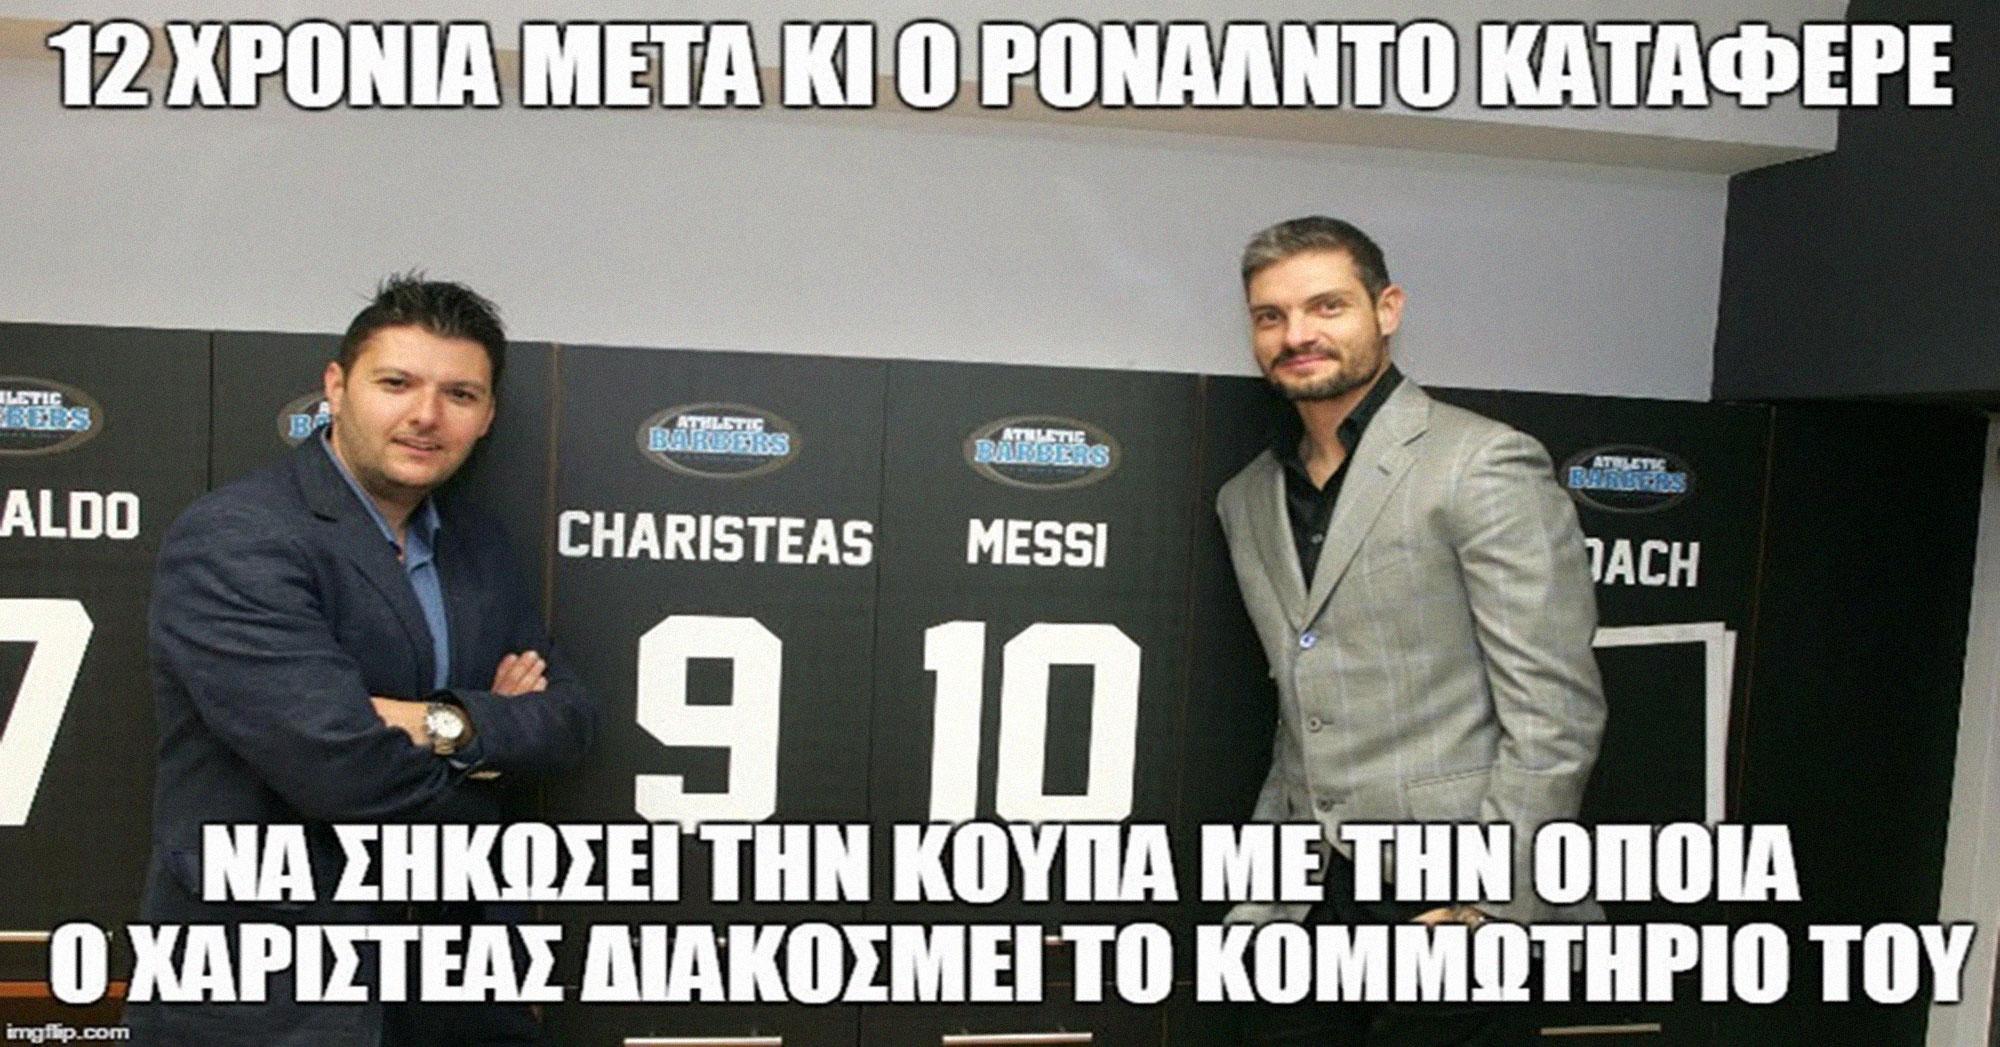 ronaldo-meme1